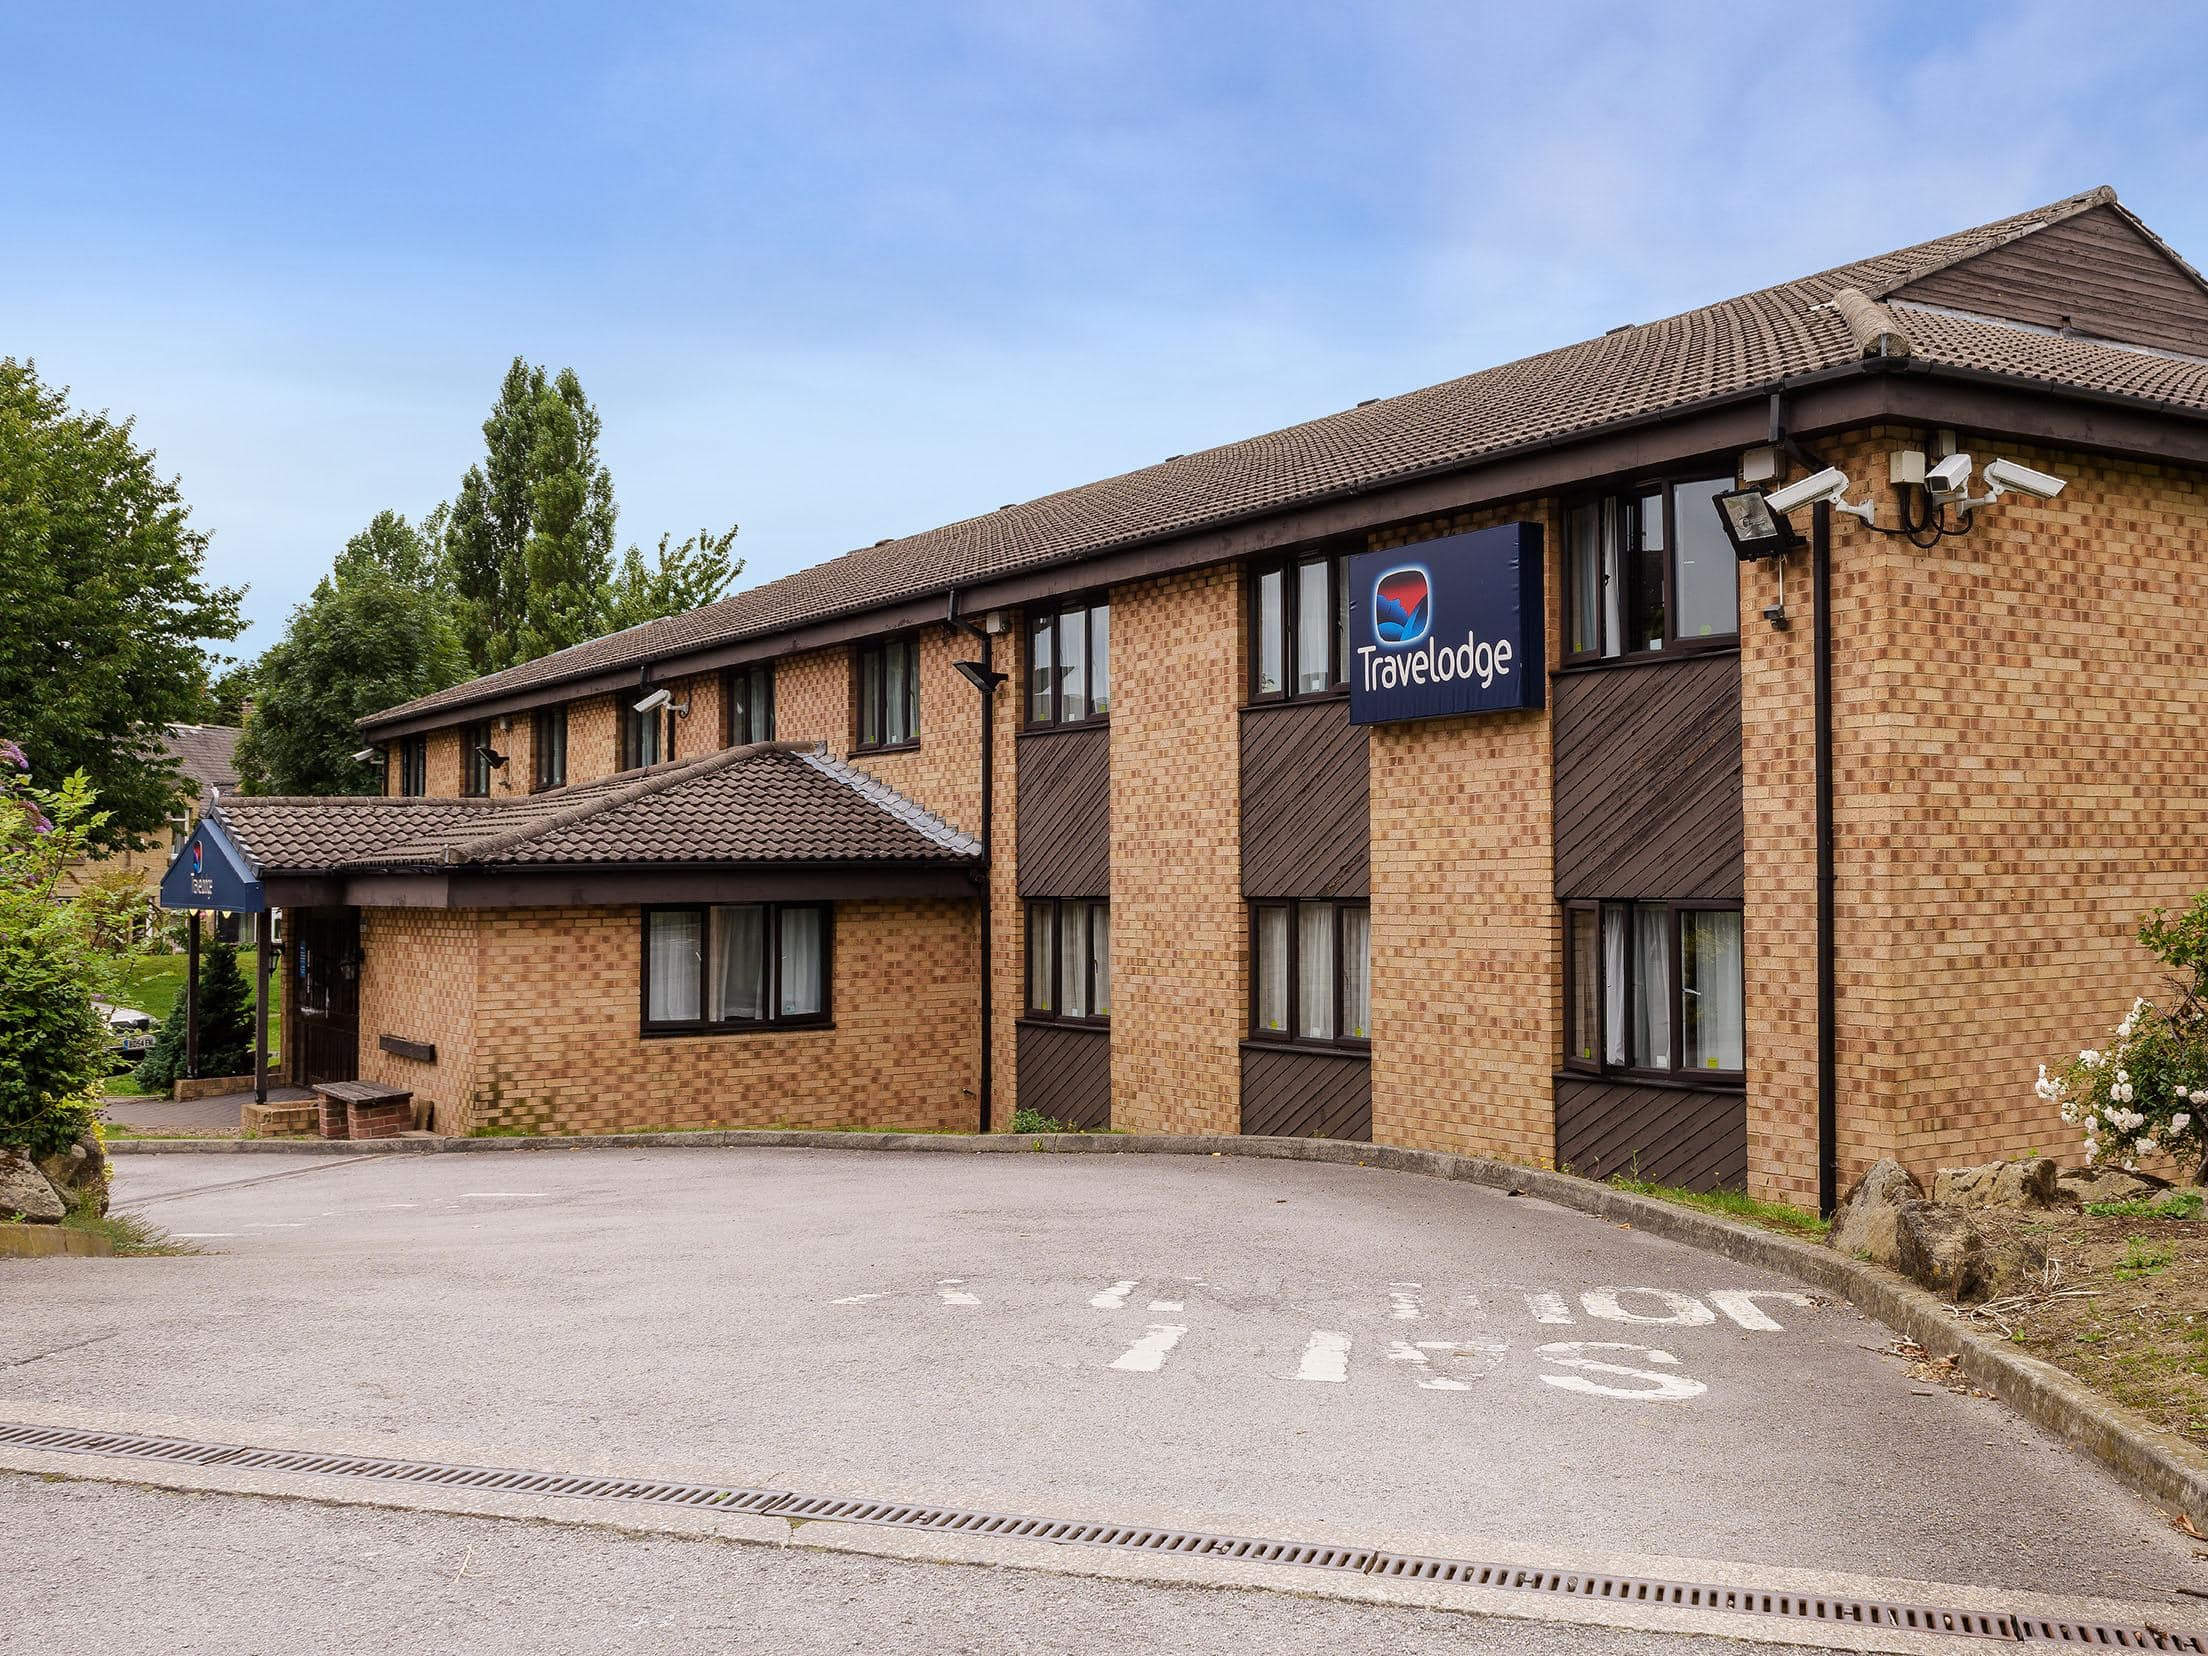 Barnsley - Exterior